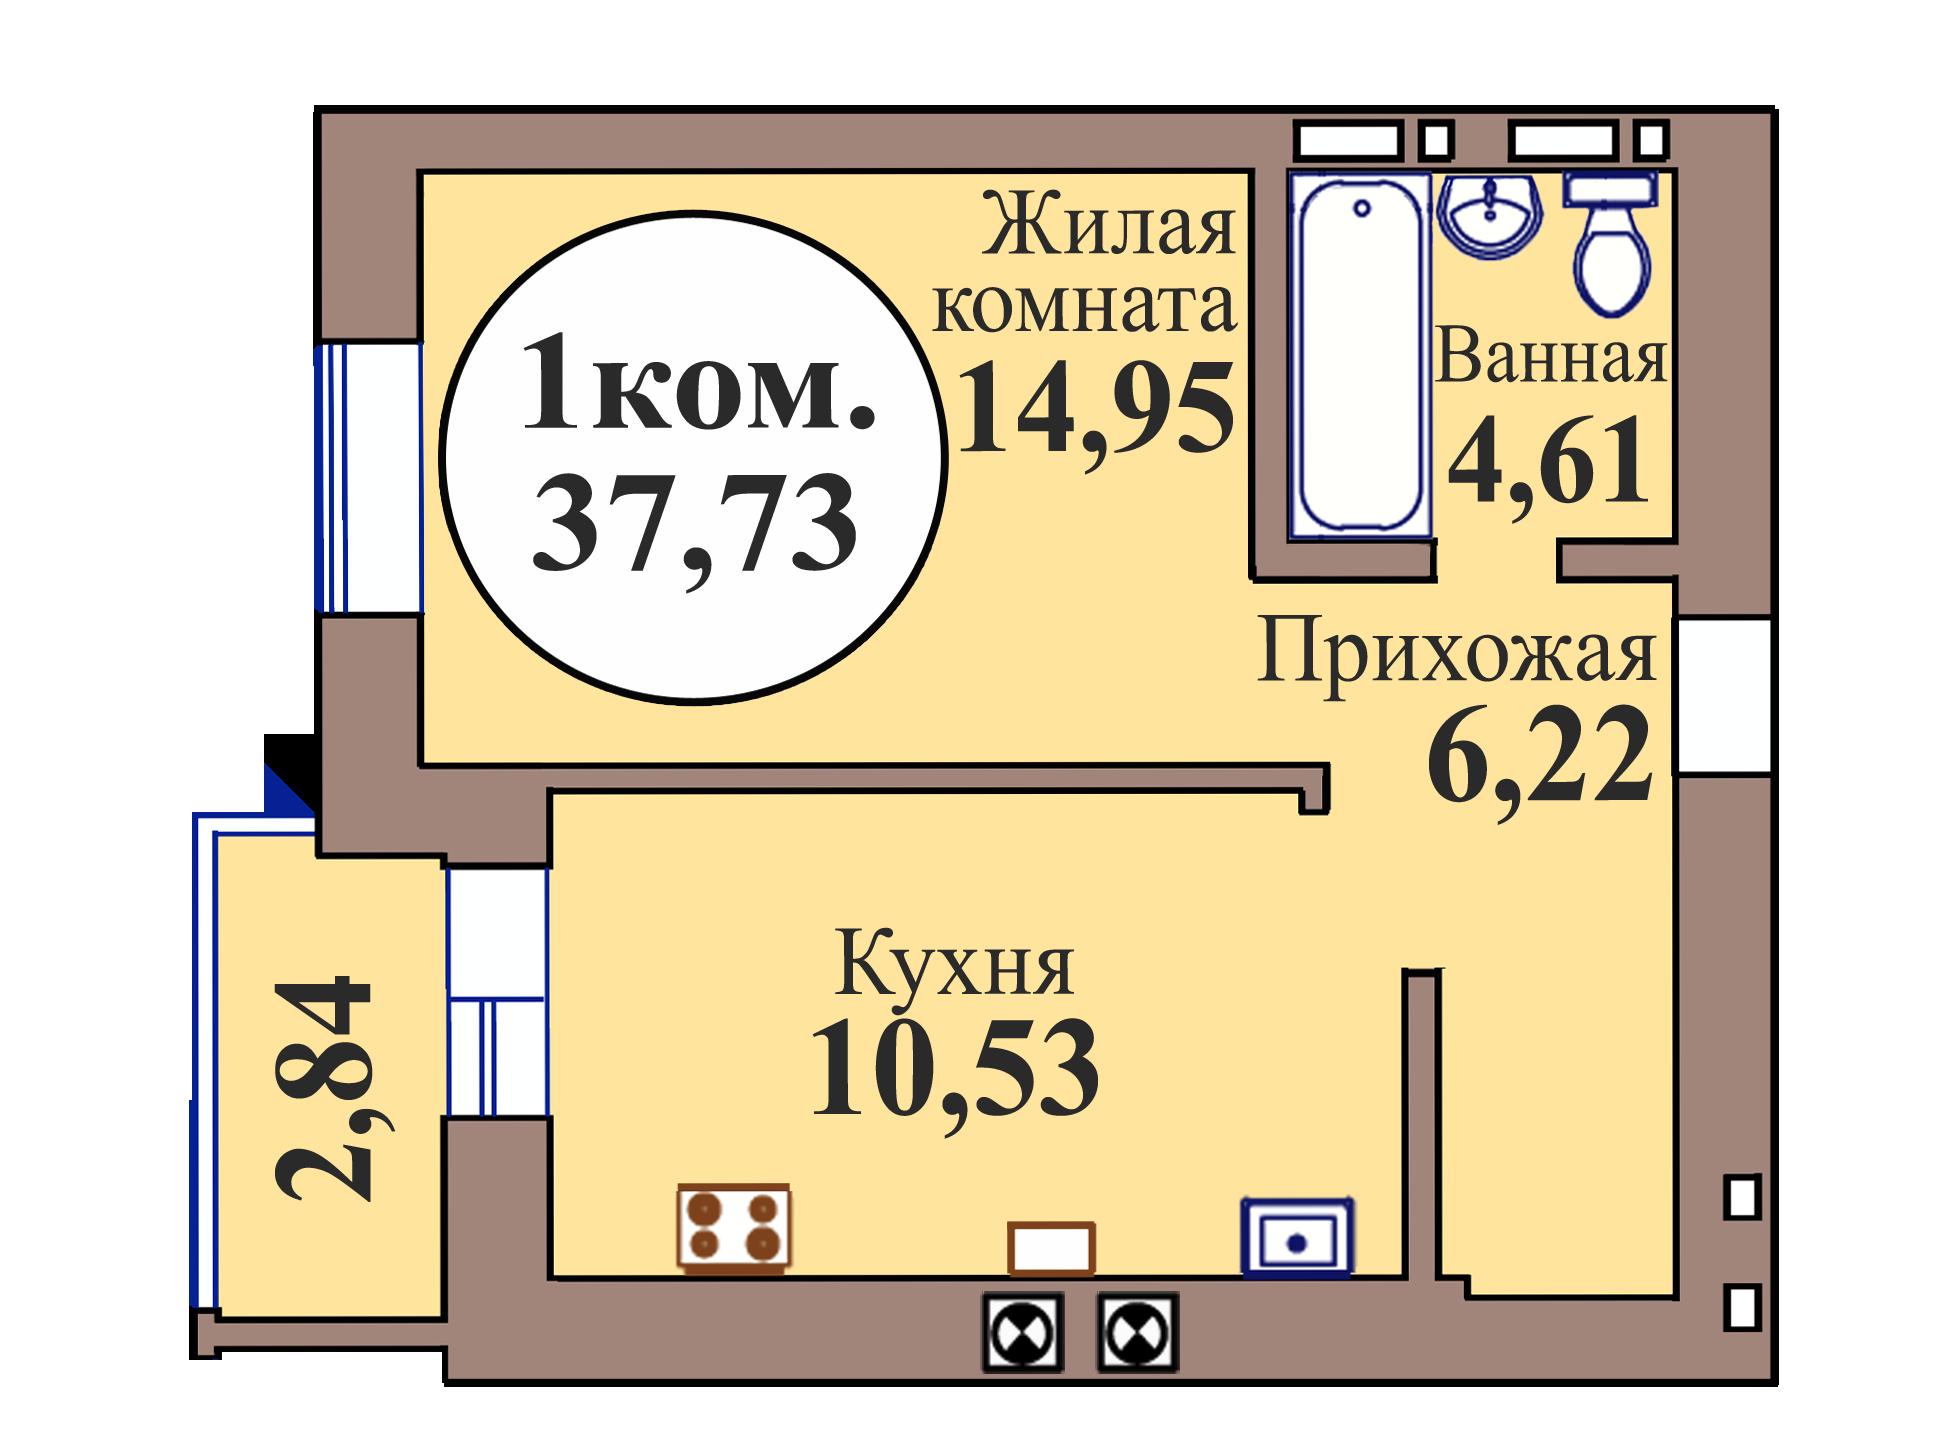 1-комн. кв. по ГП дом №3, МКР Васильково, кв. 226 в Калининграде